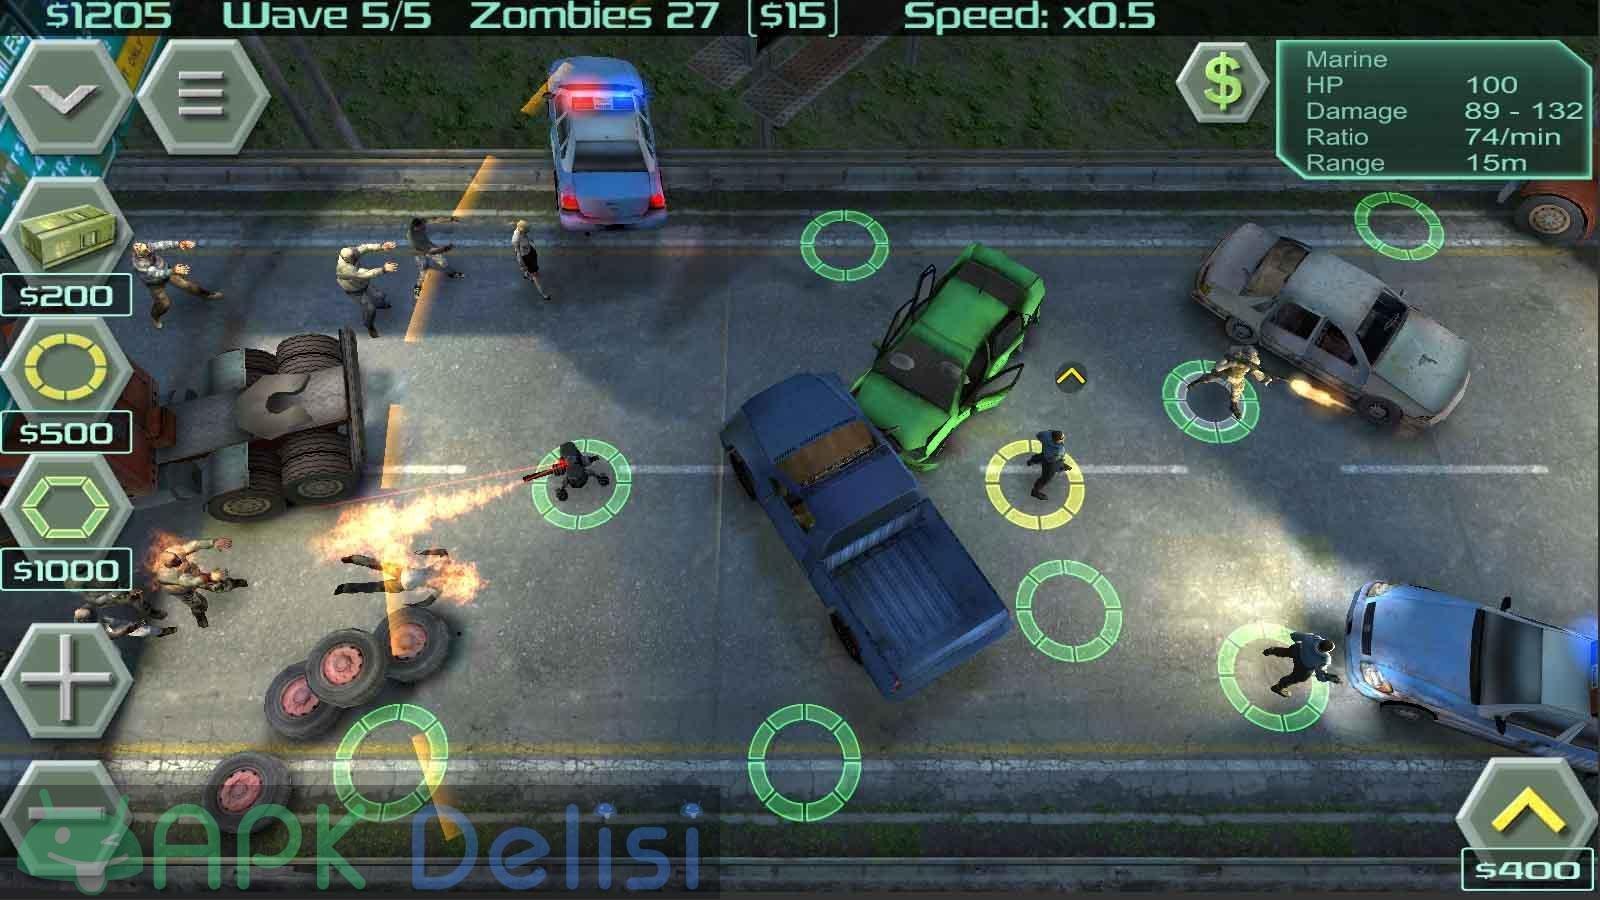 Zombie Defense v12.8.2 MOD APK — PARA HİLELİ 2